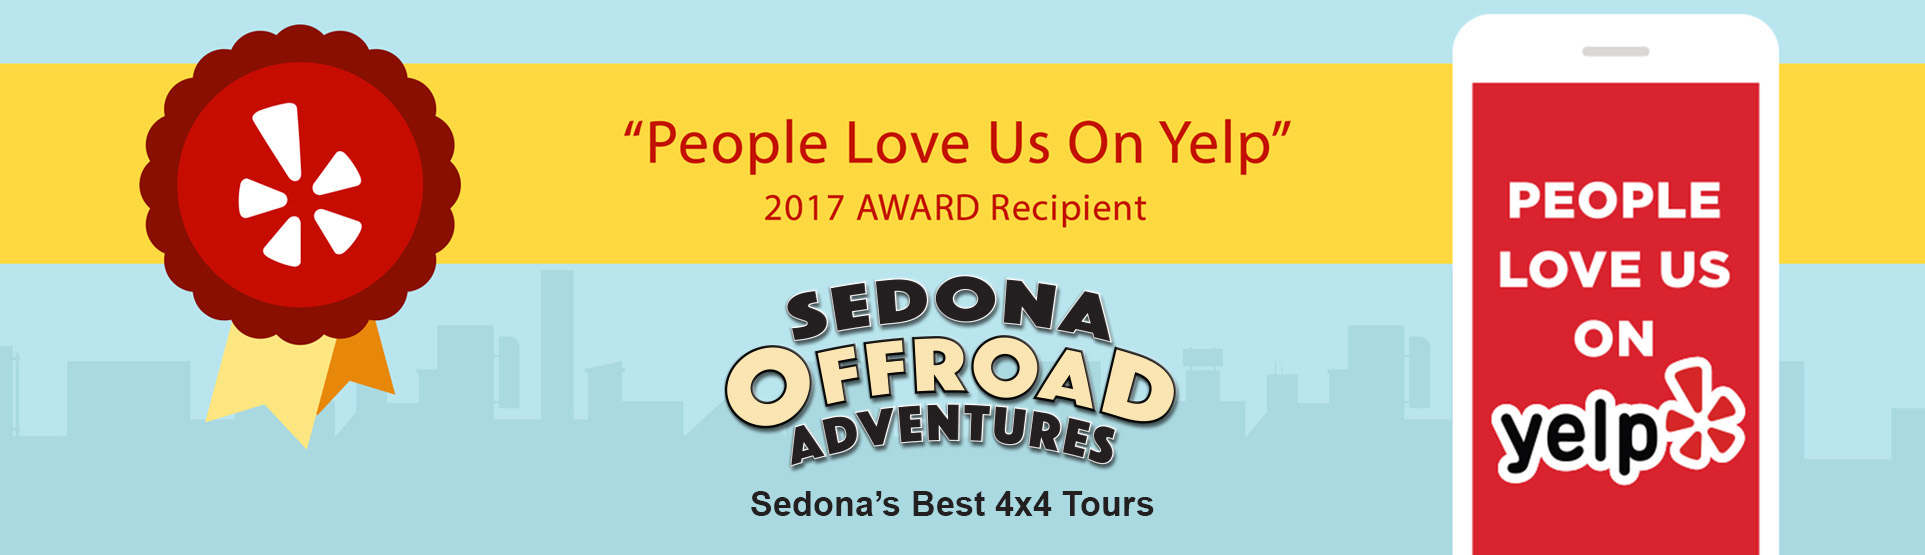 Sedona Offroad Adventures 928-282-6656